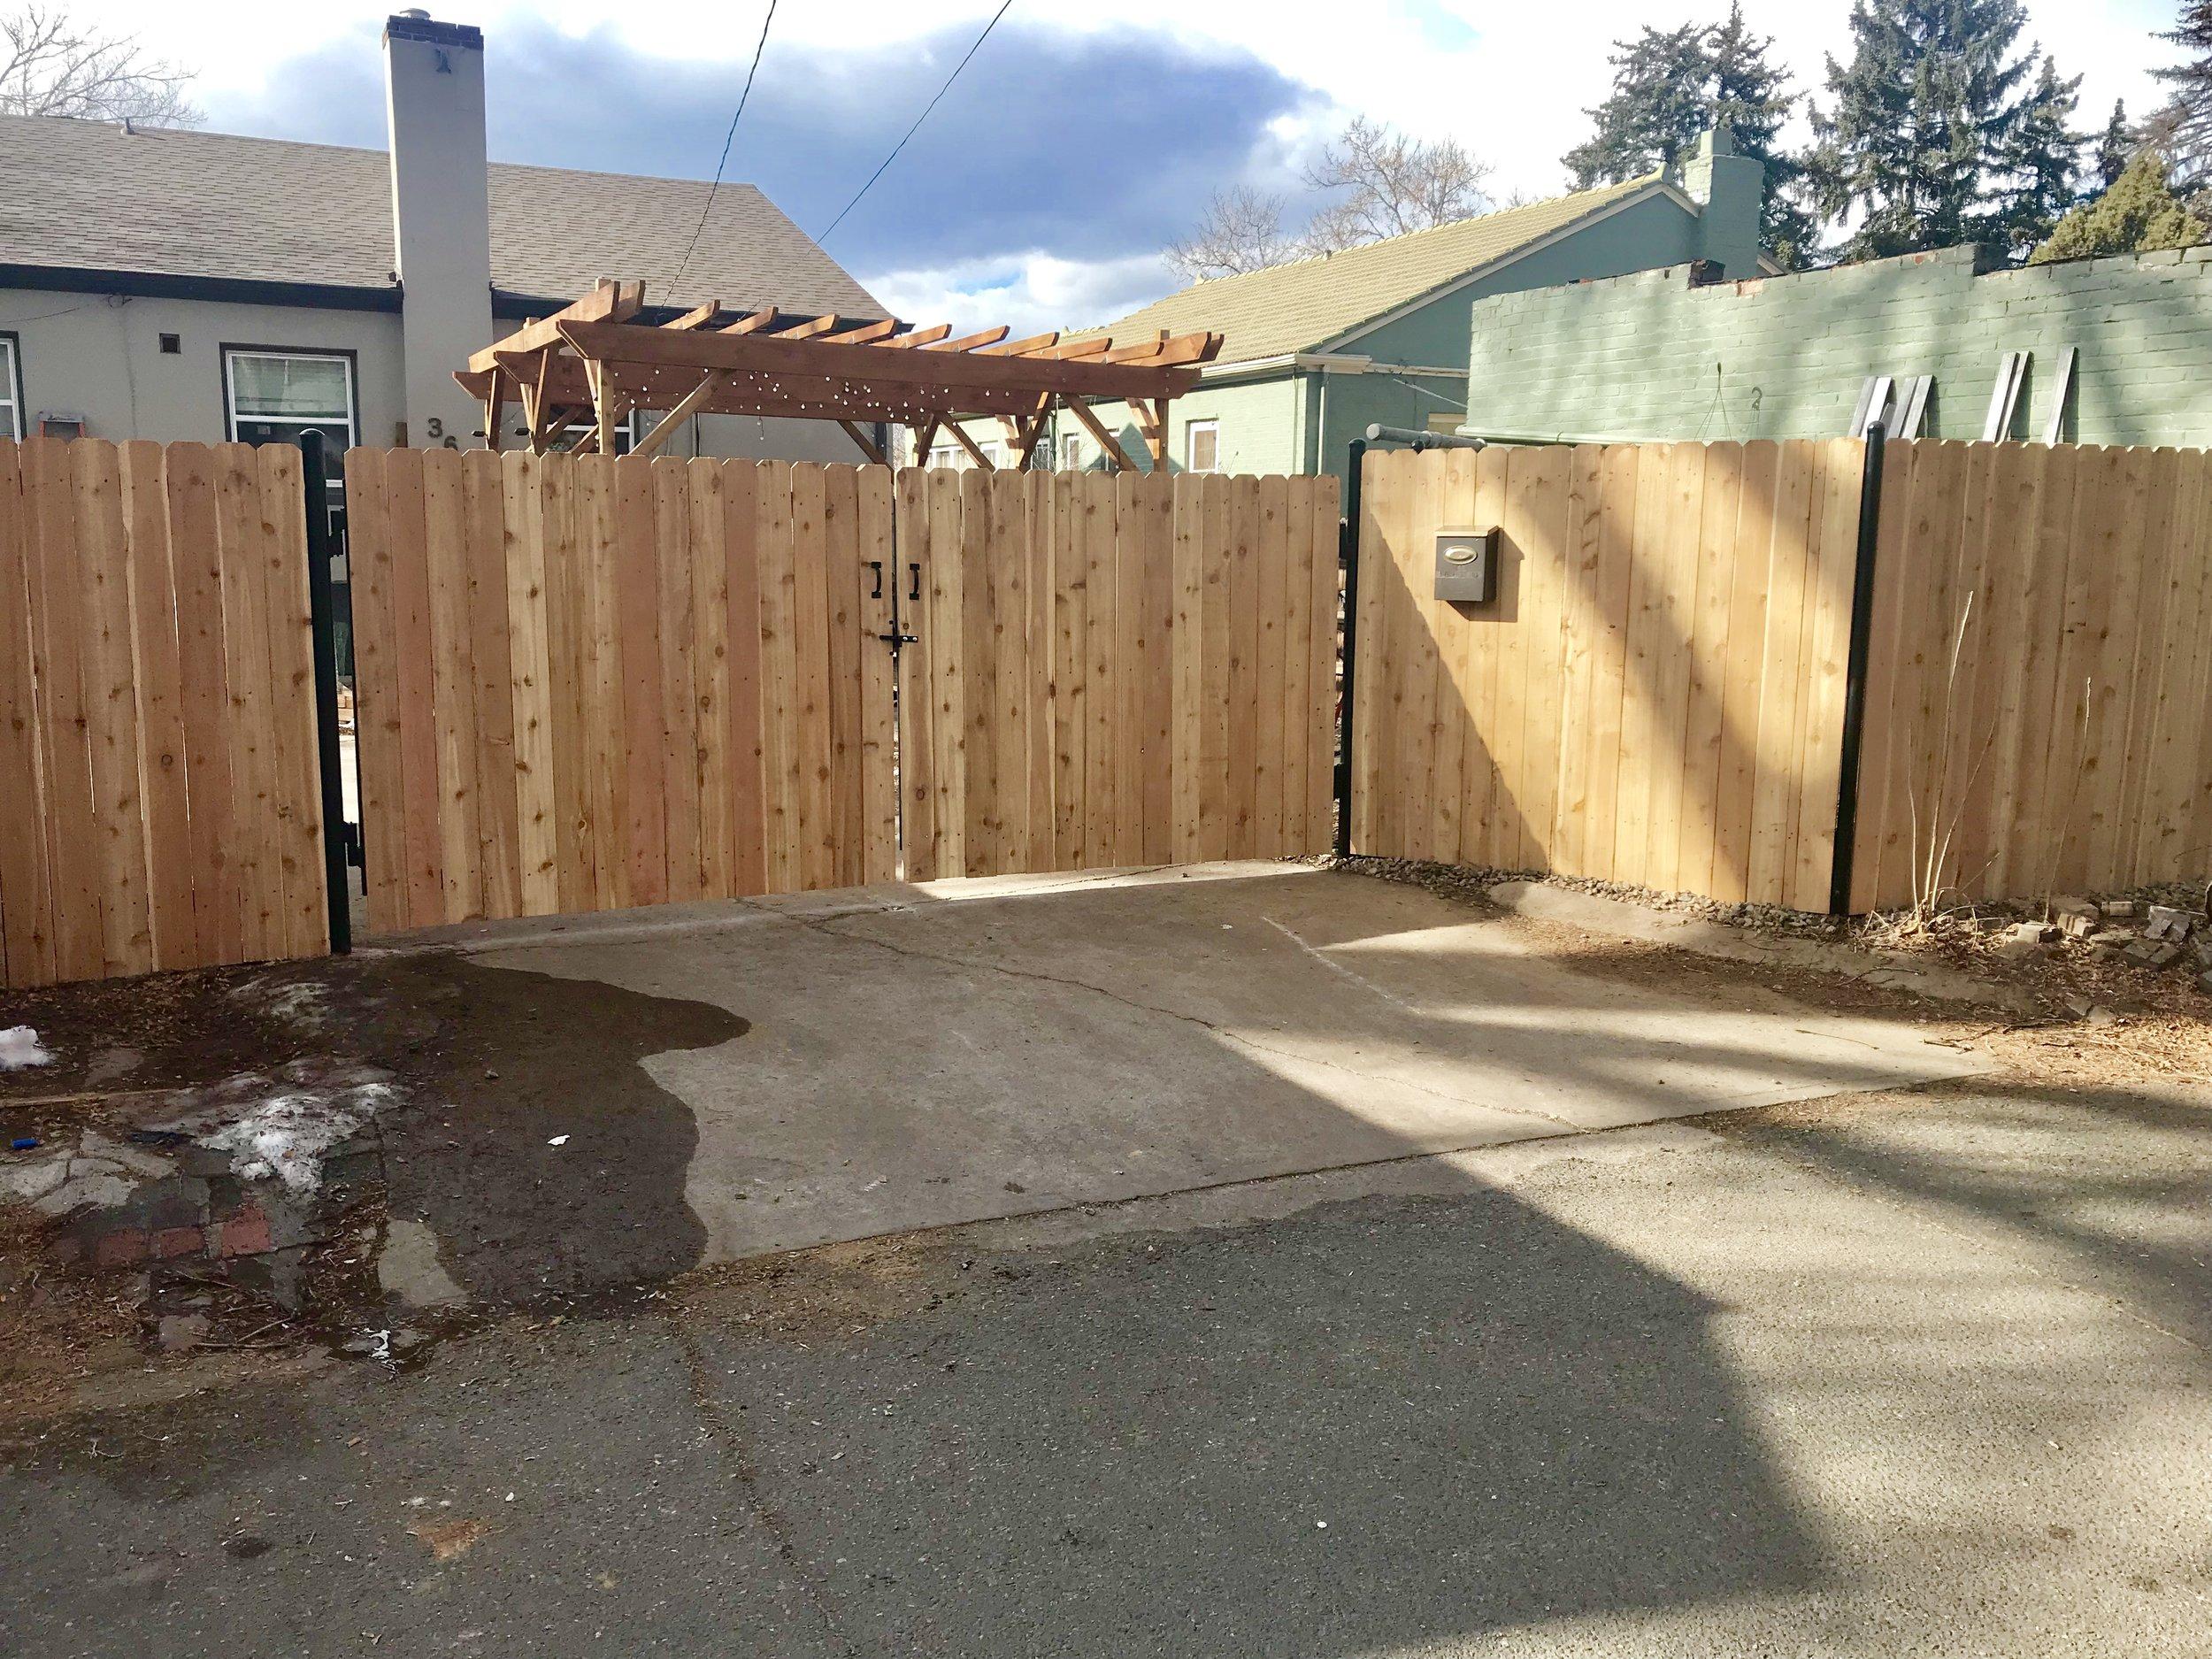 Double swing gate - Vertical cedar on top of steel frame/post